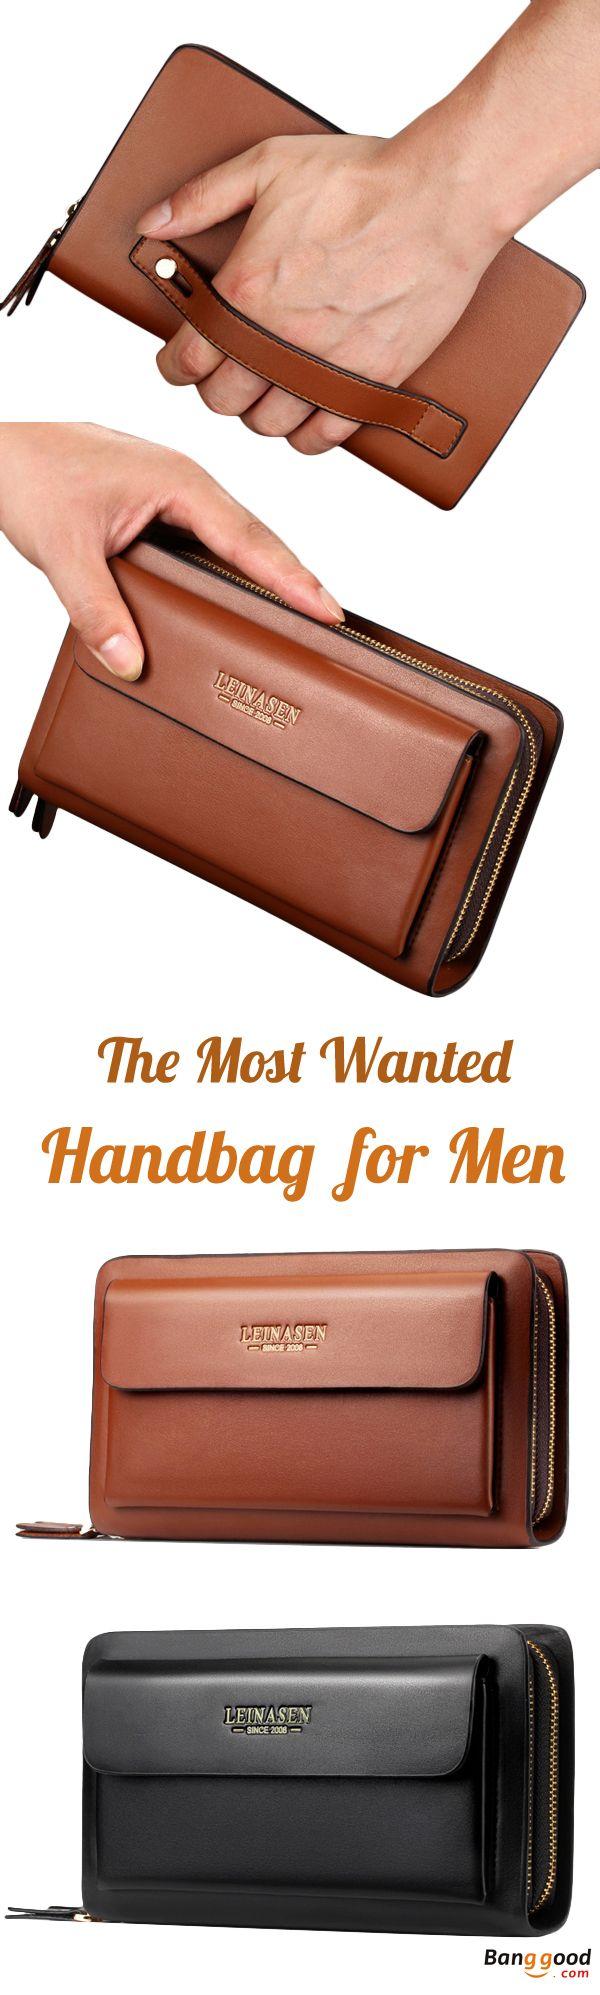 US$29.98 + Free shipping. Men\'s Bag, Business Bag, Clutch Bag, Men\'s ...